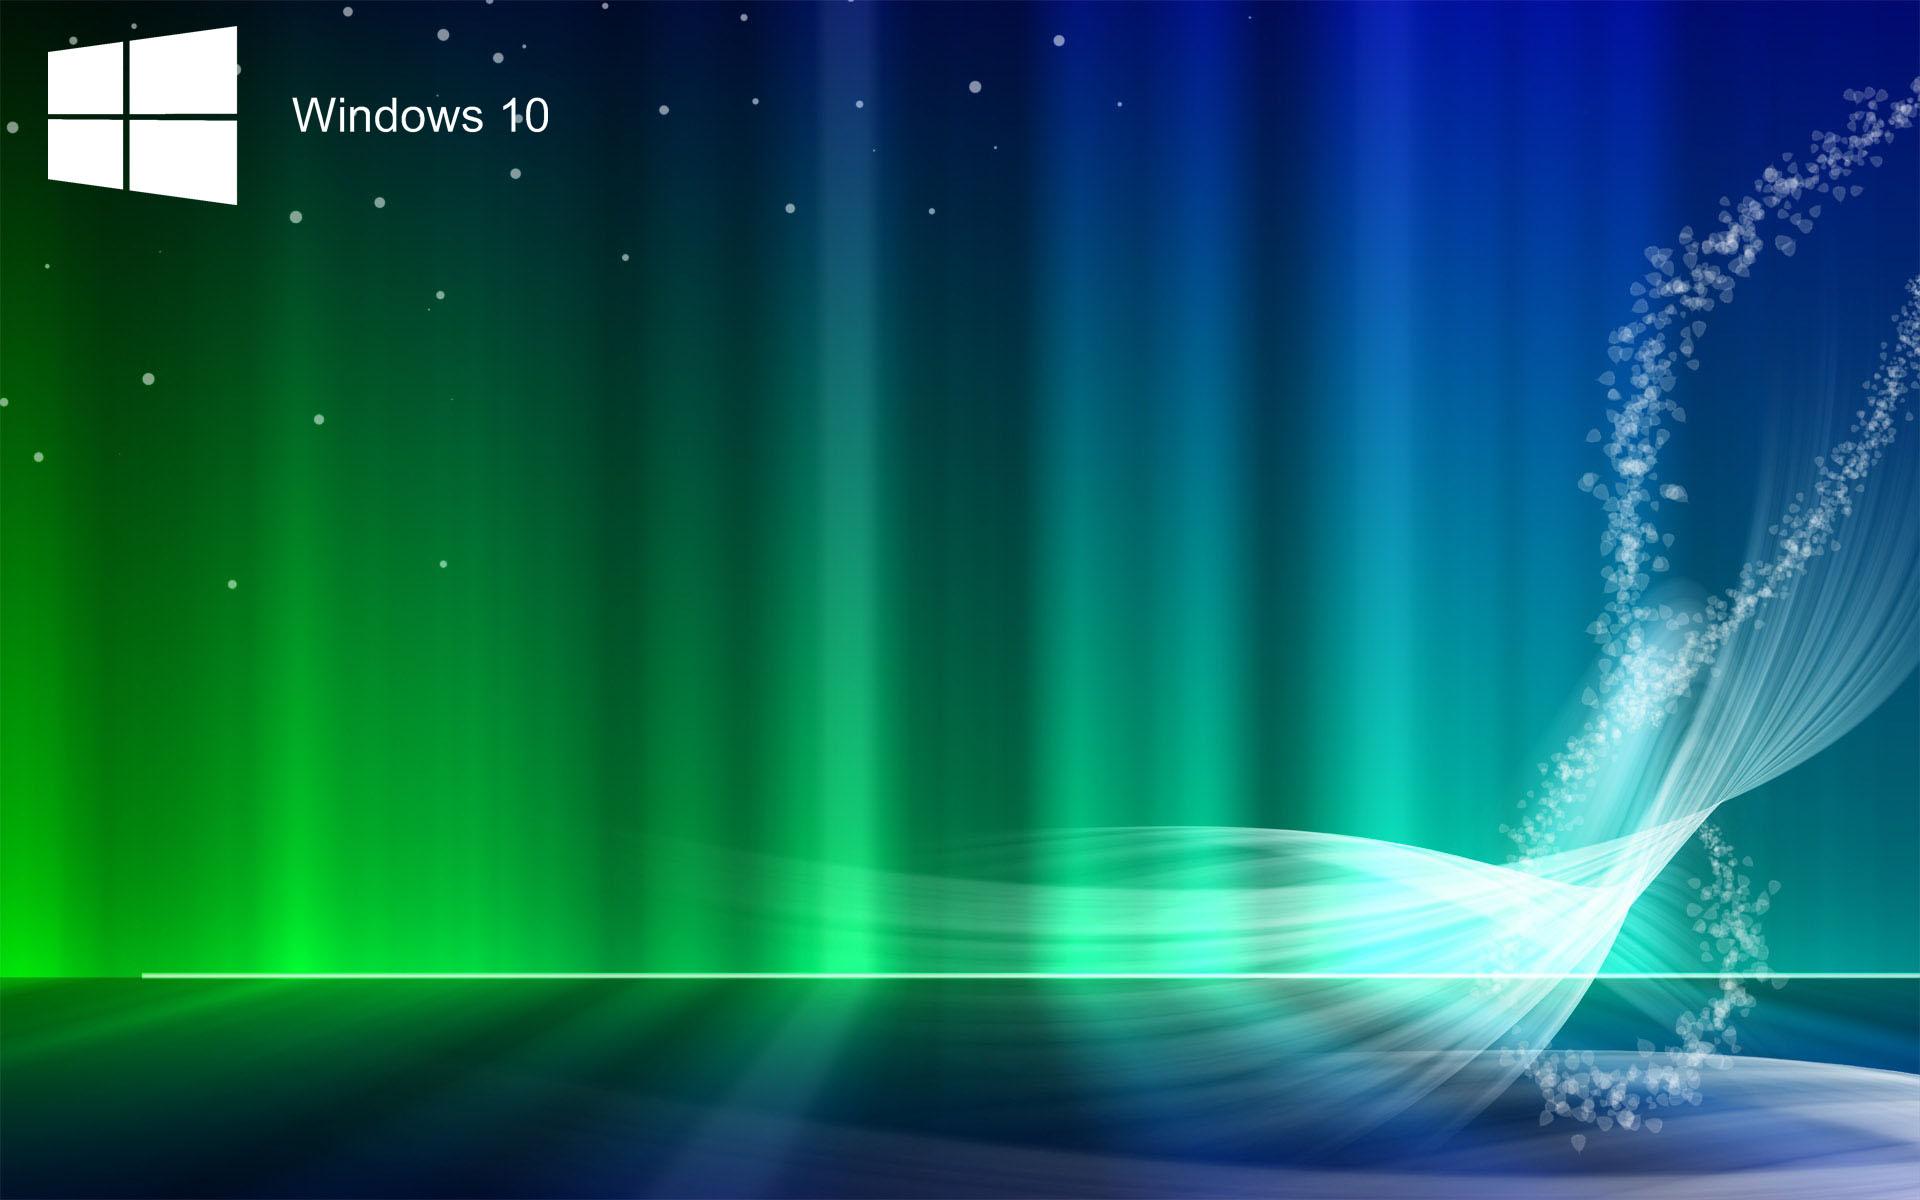 laptop hd wallpapers for windows 10 | pixelstalk